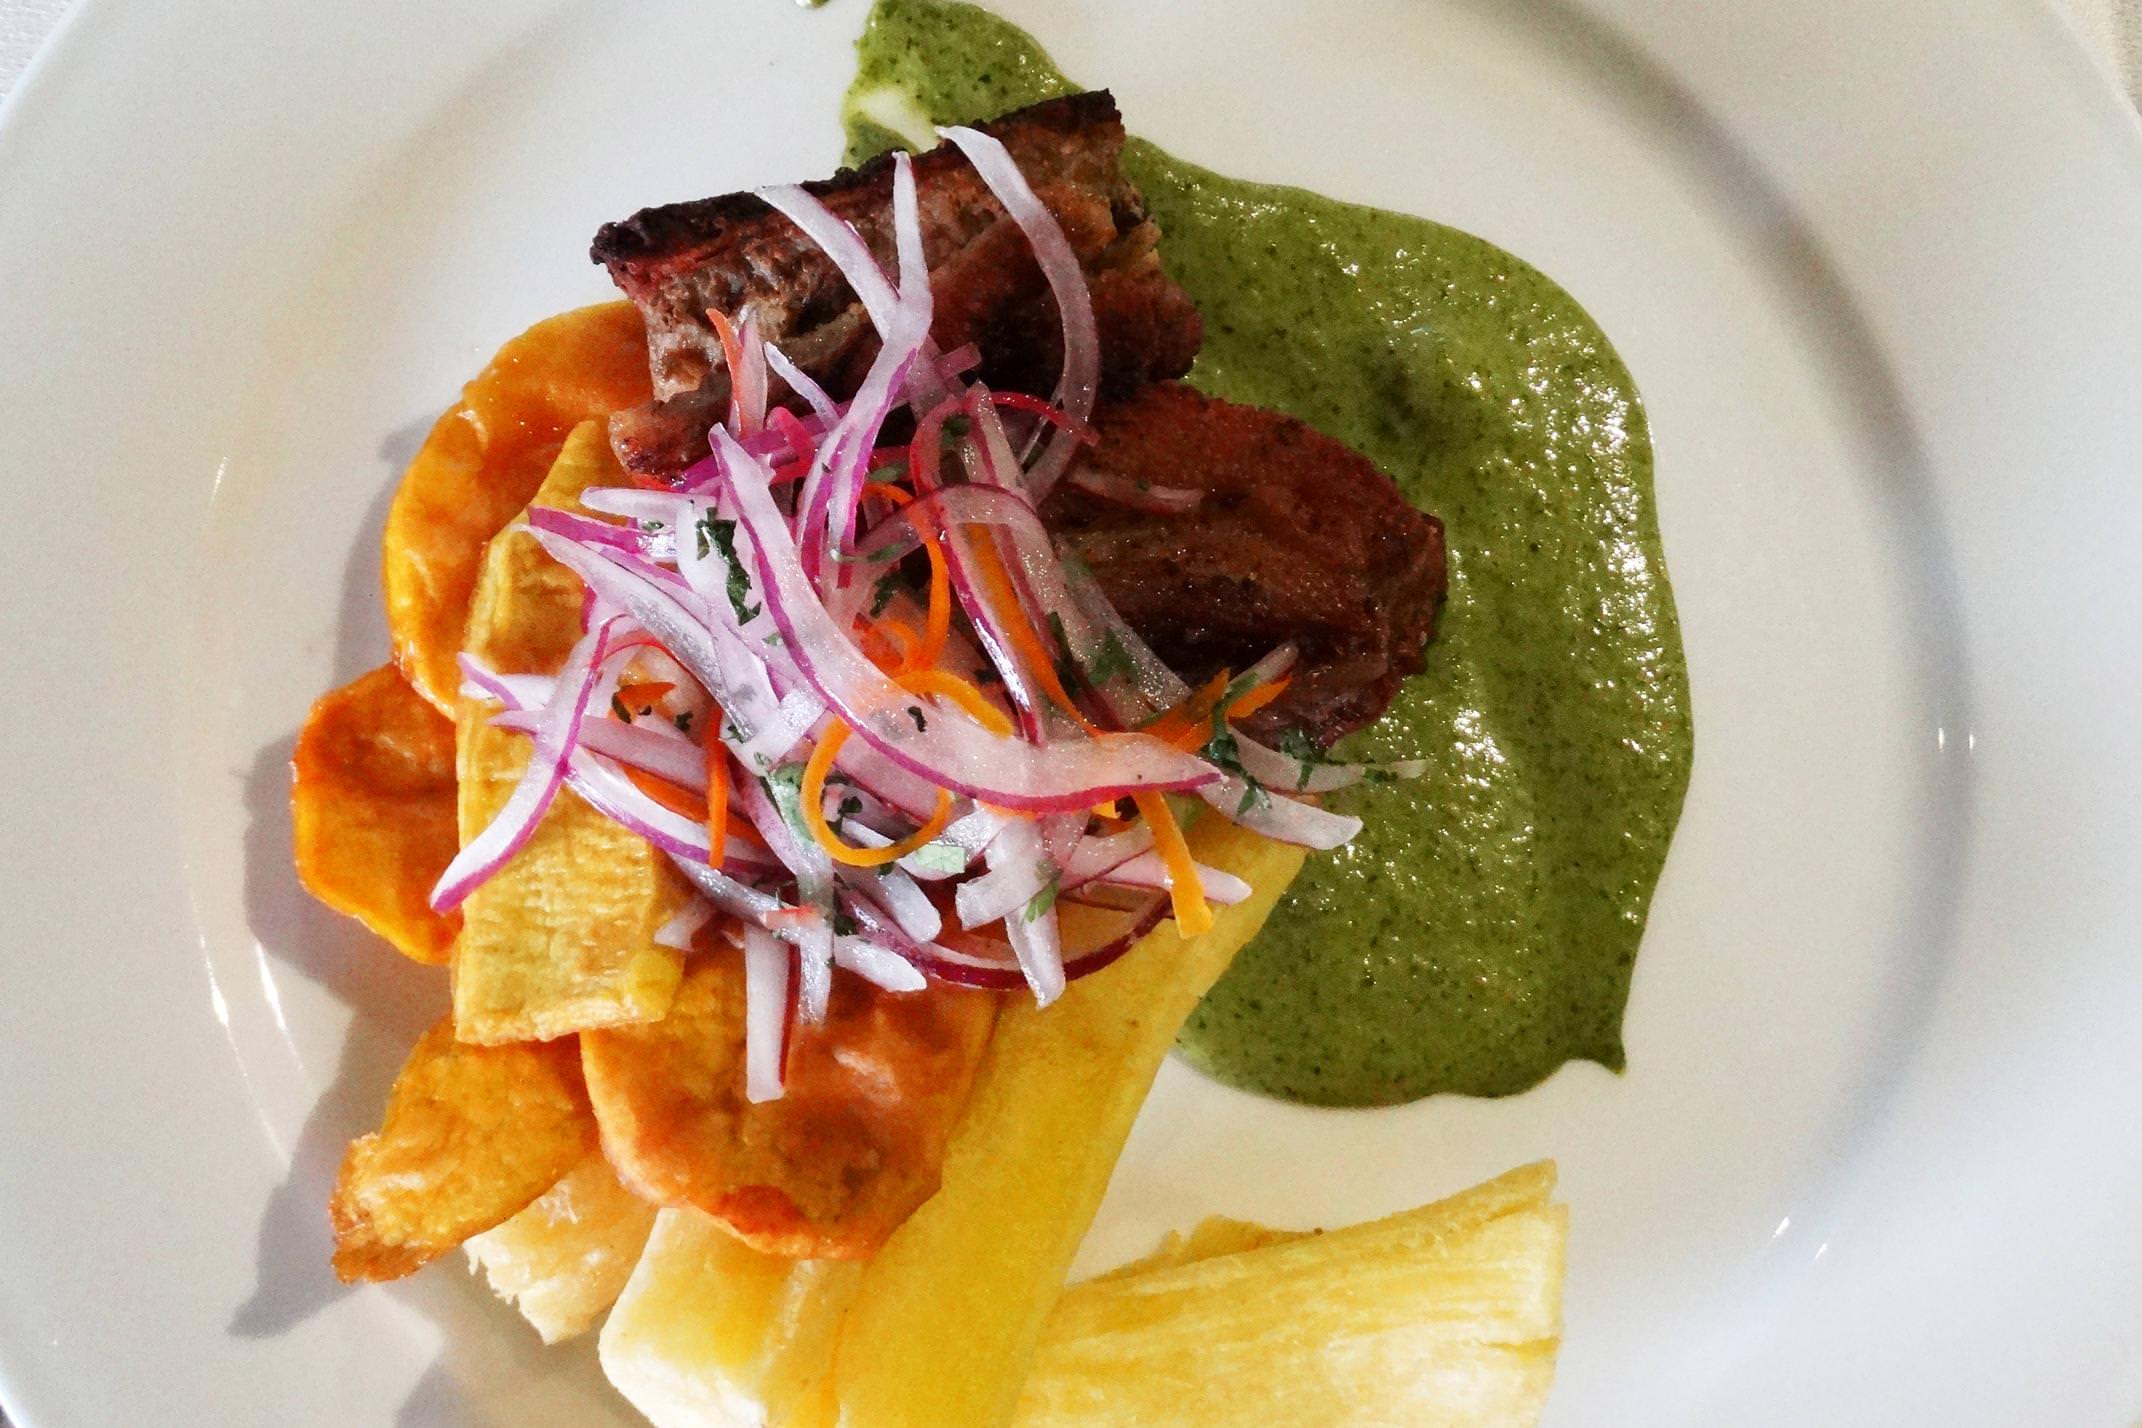 Peru lima food chicharron 4